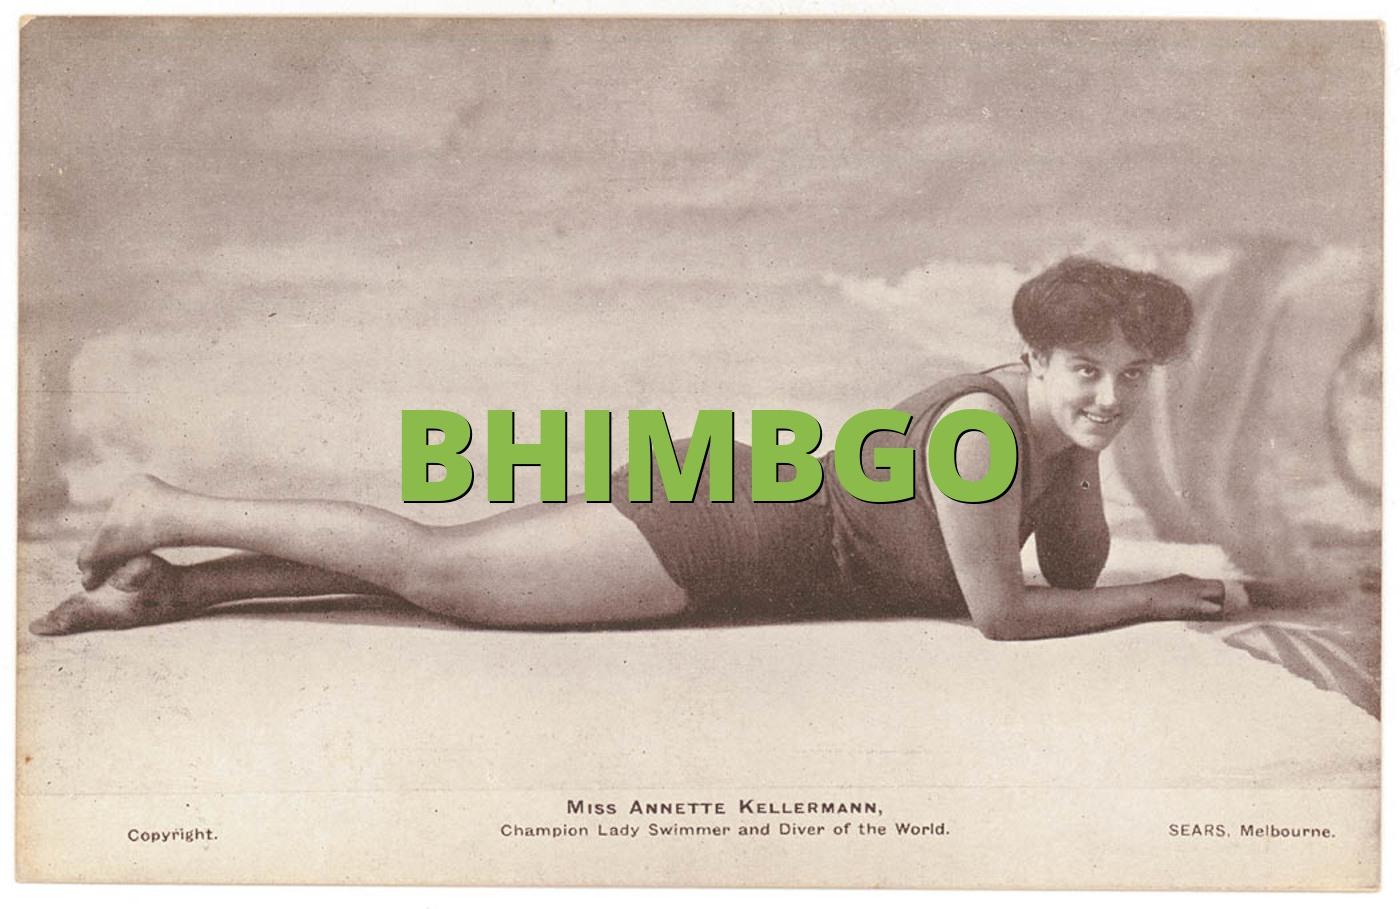 BHIMBGO